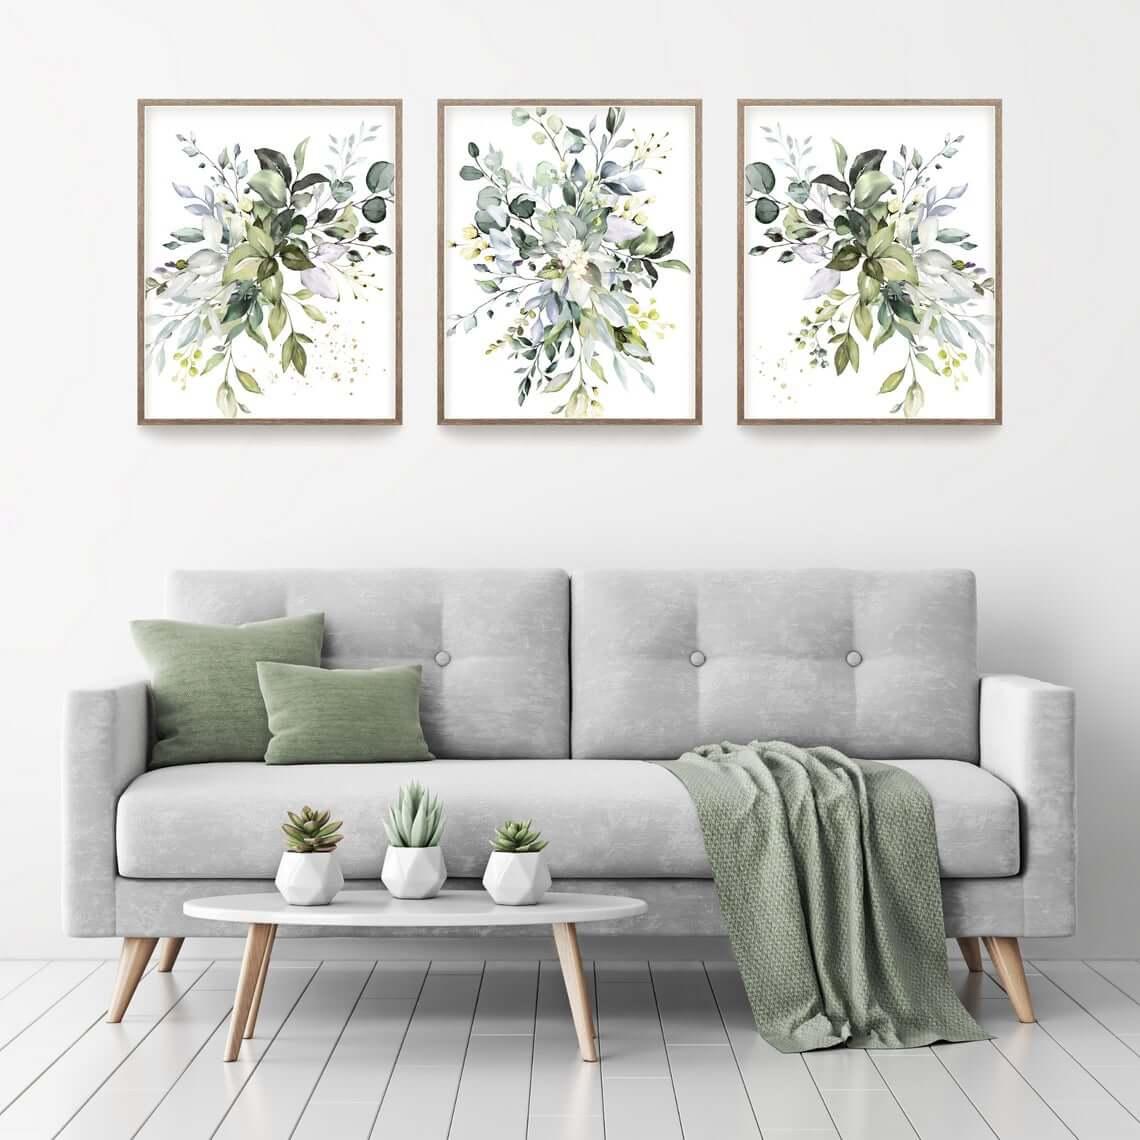 Botanical Abstract Wall Art Painting